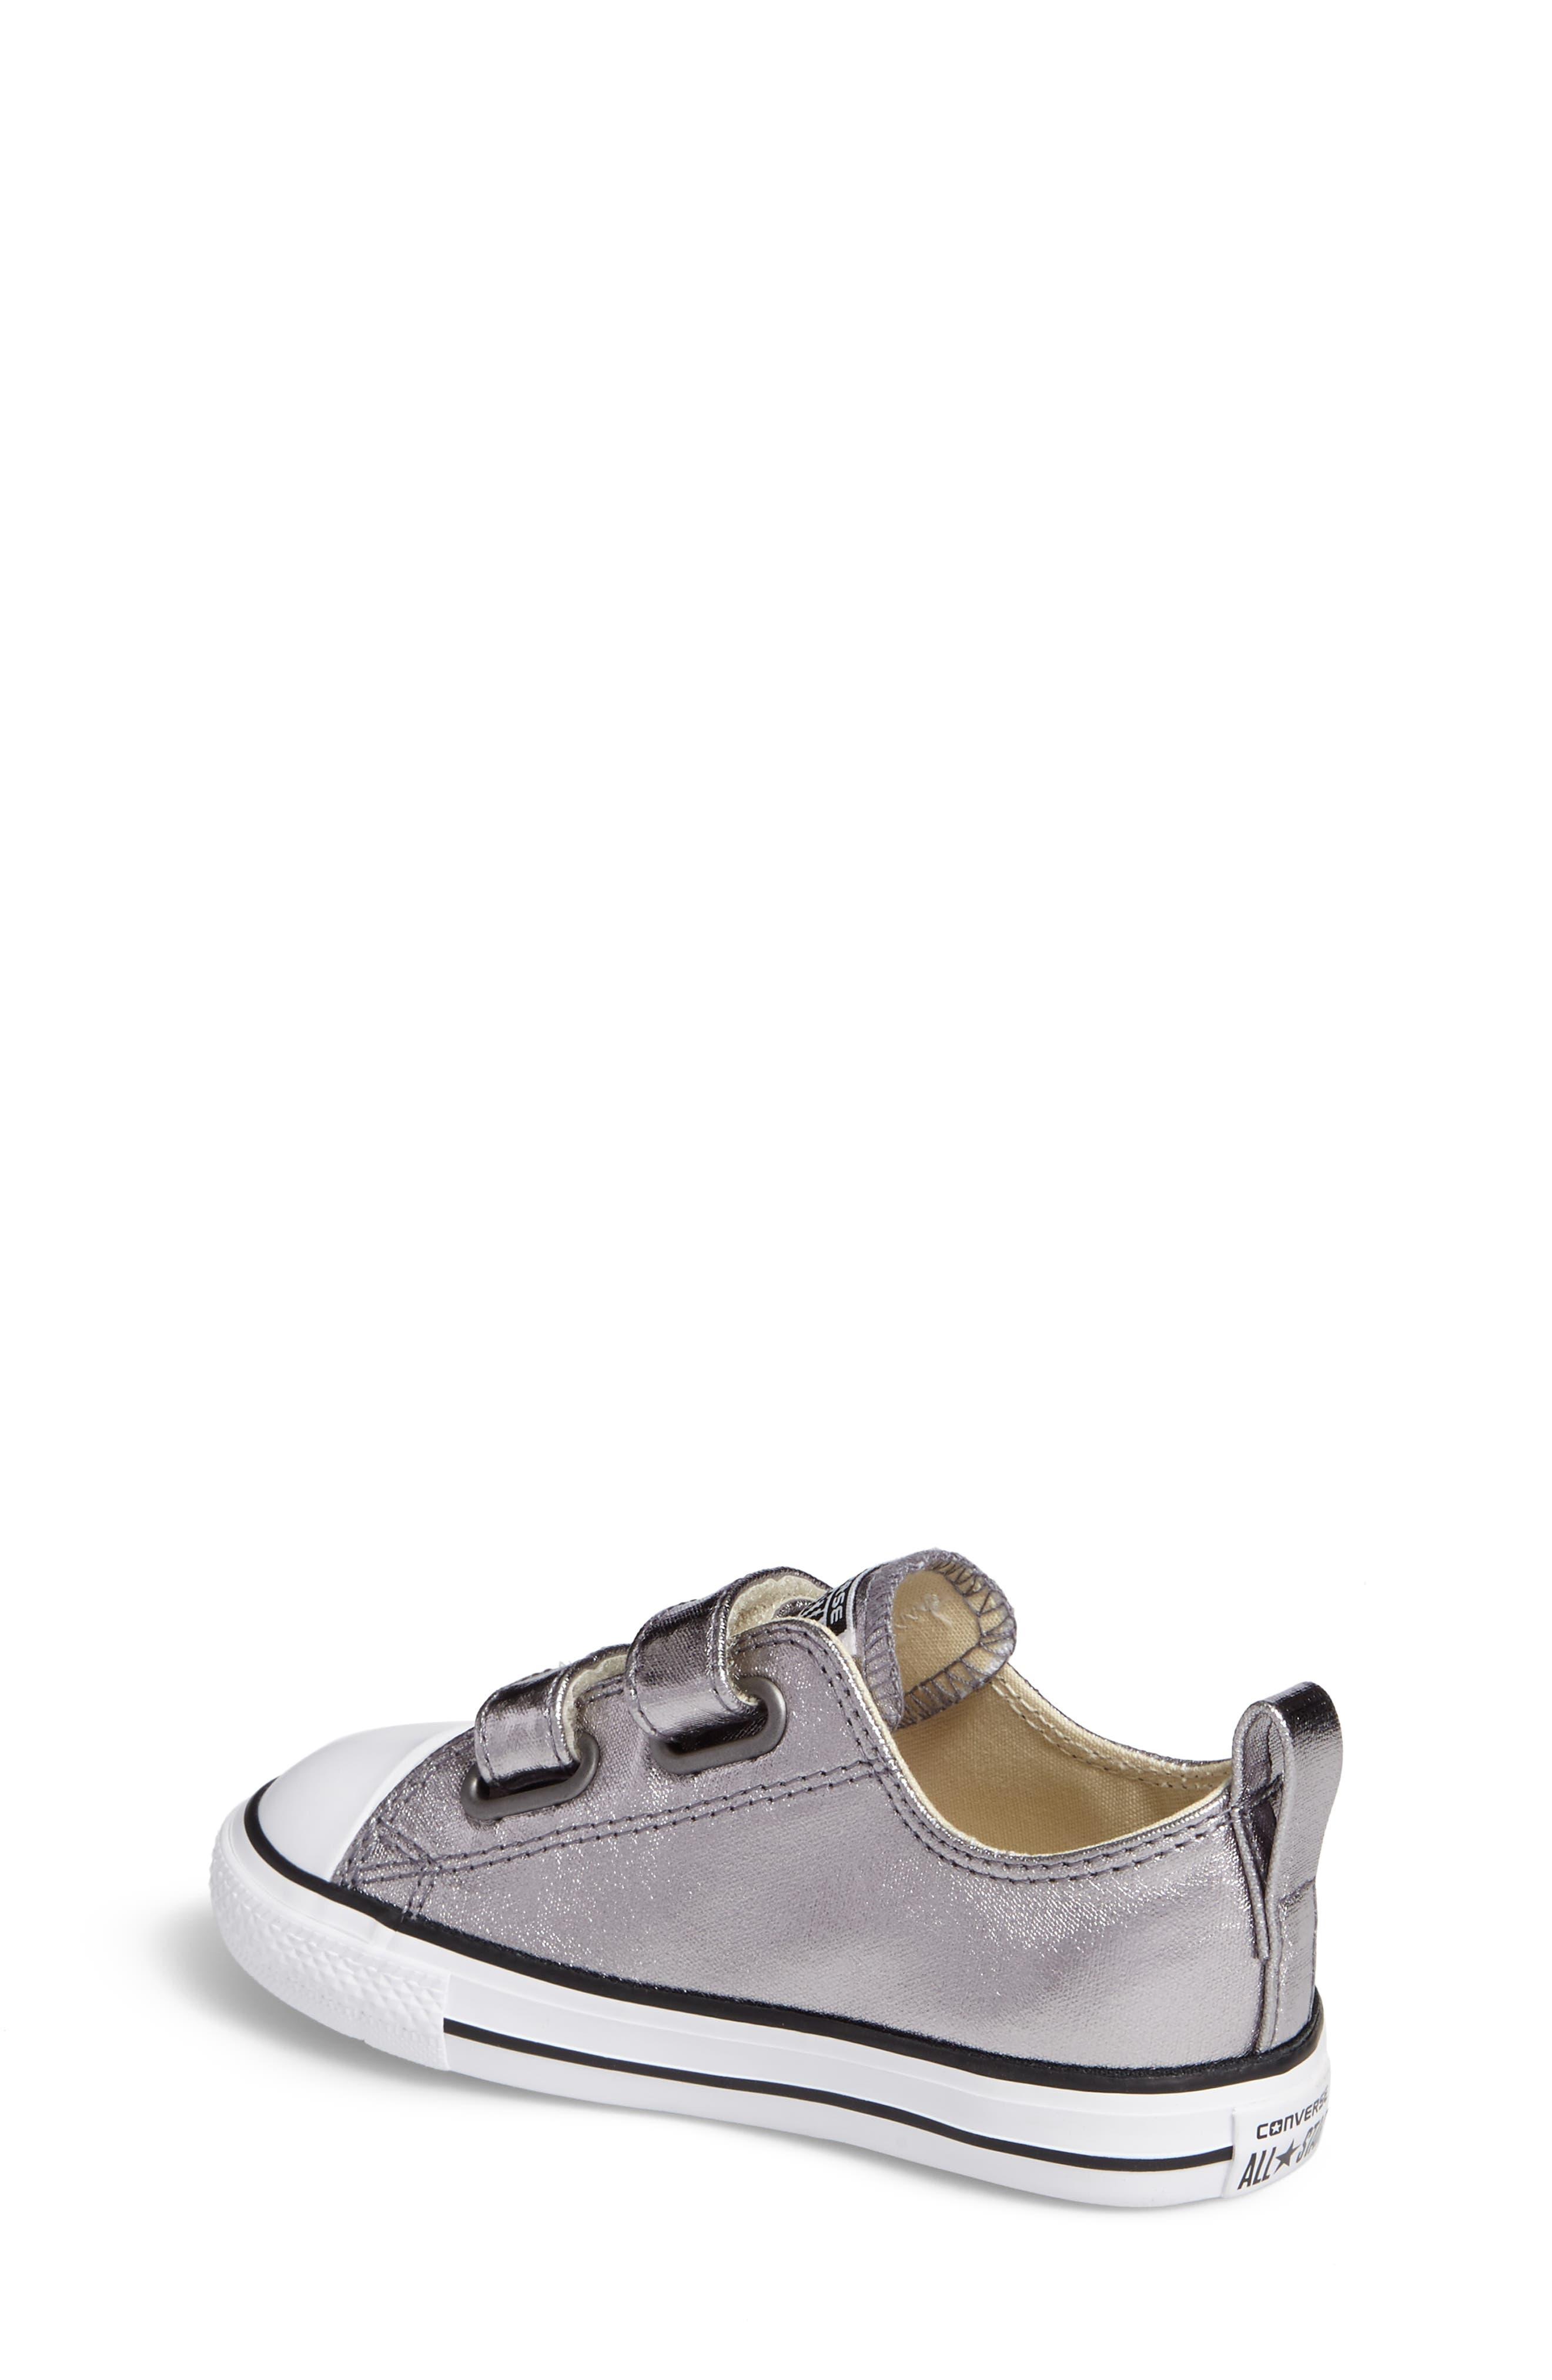 Chuck Taylor<sup>®</sup> All Star<sup>®</sup> Seasonal Metallic Low Top Sneaker,                             Alternate thumbnail 2, color,                             040